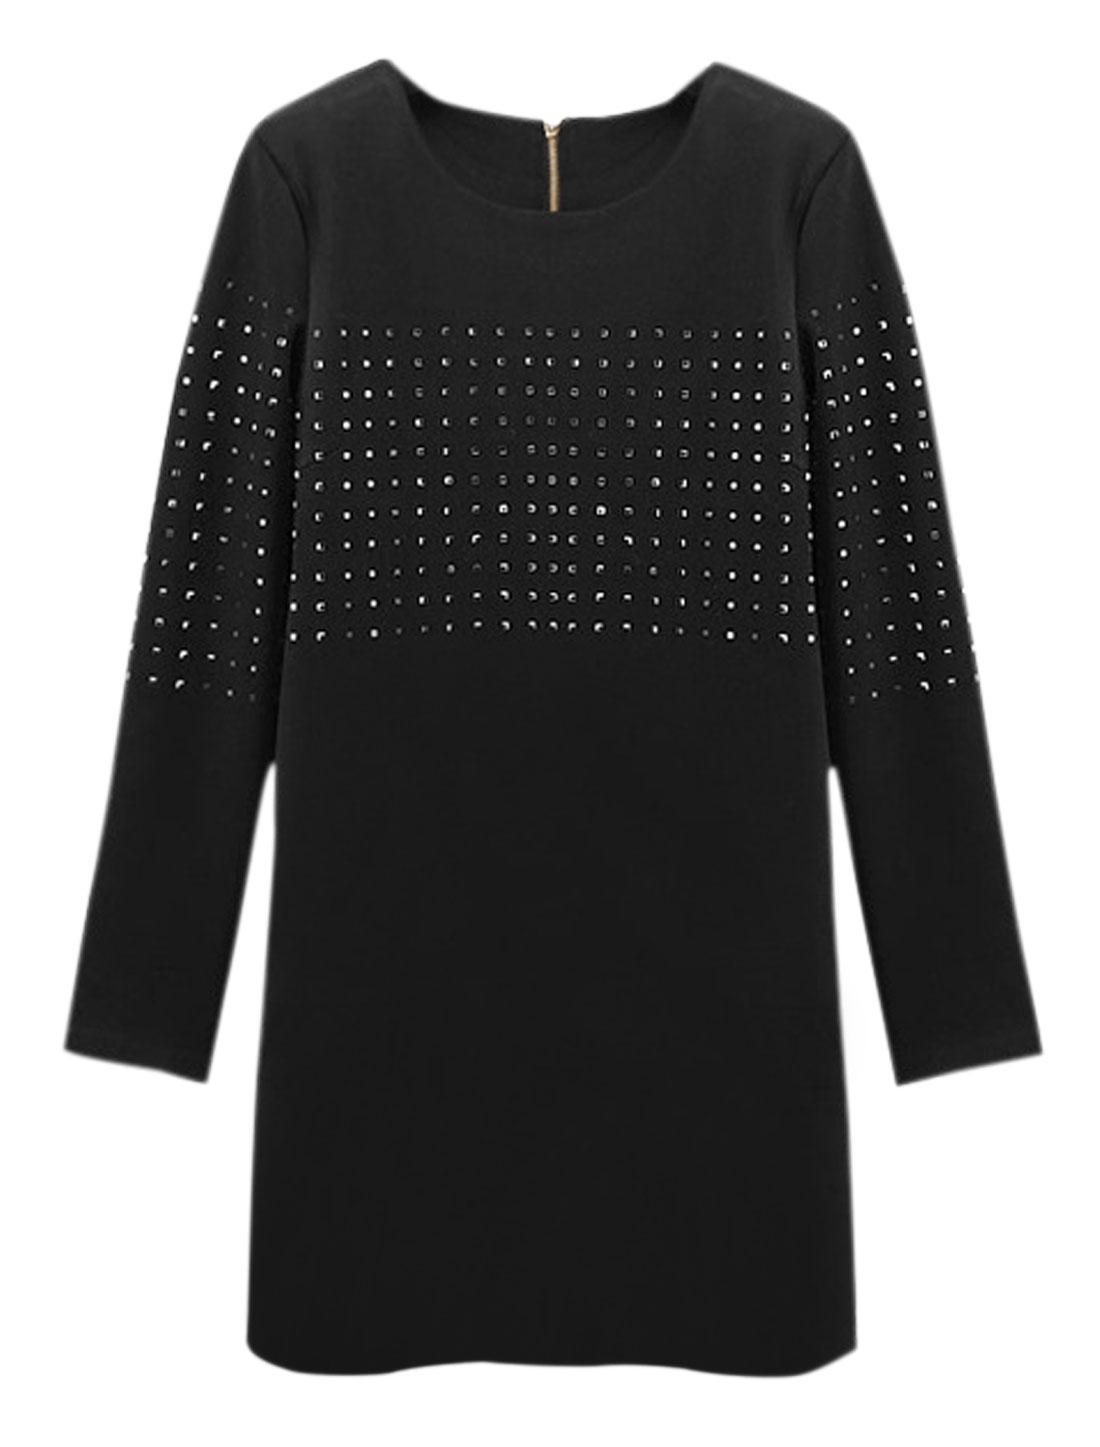 Women Long Sleeves Rhinestone Embellished Loose Tunic Dress Black S